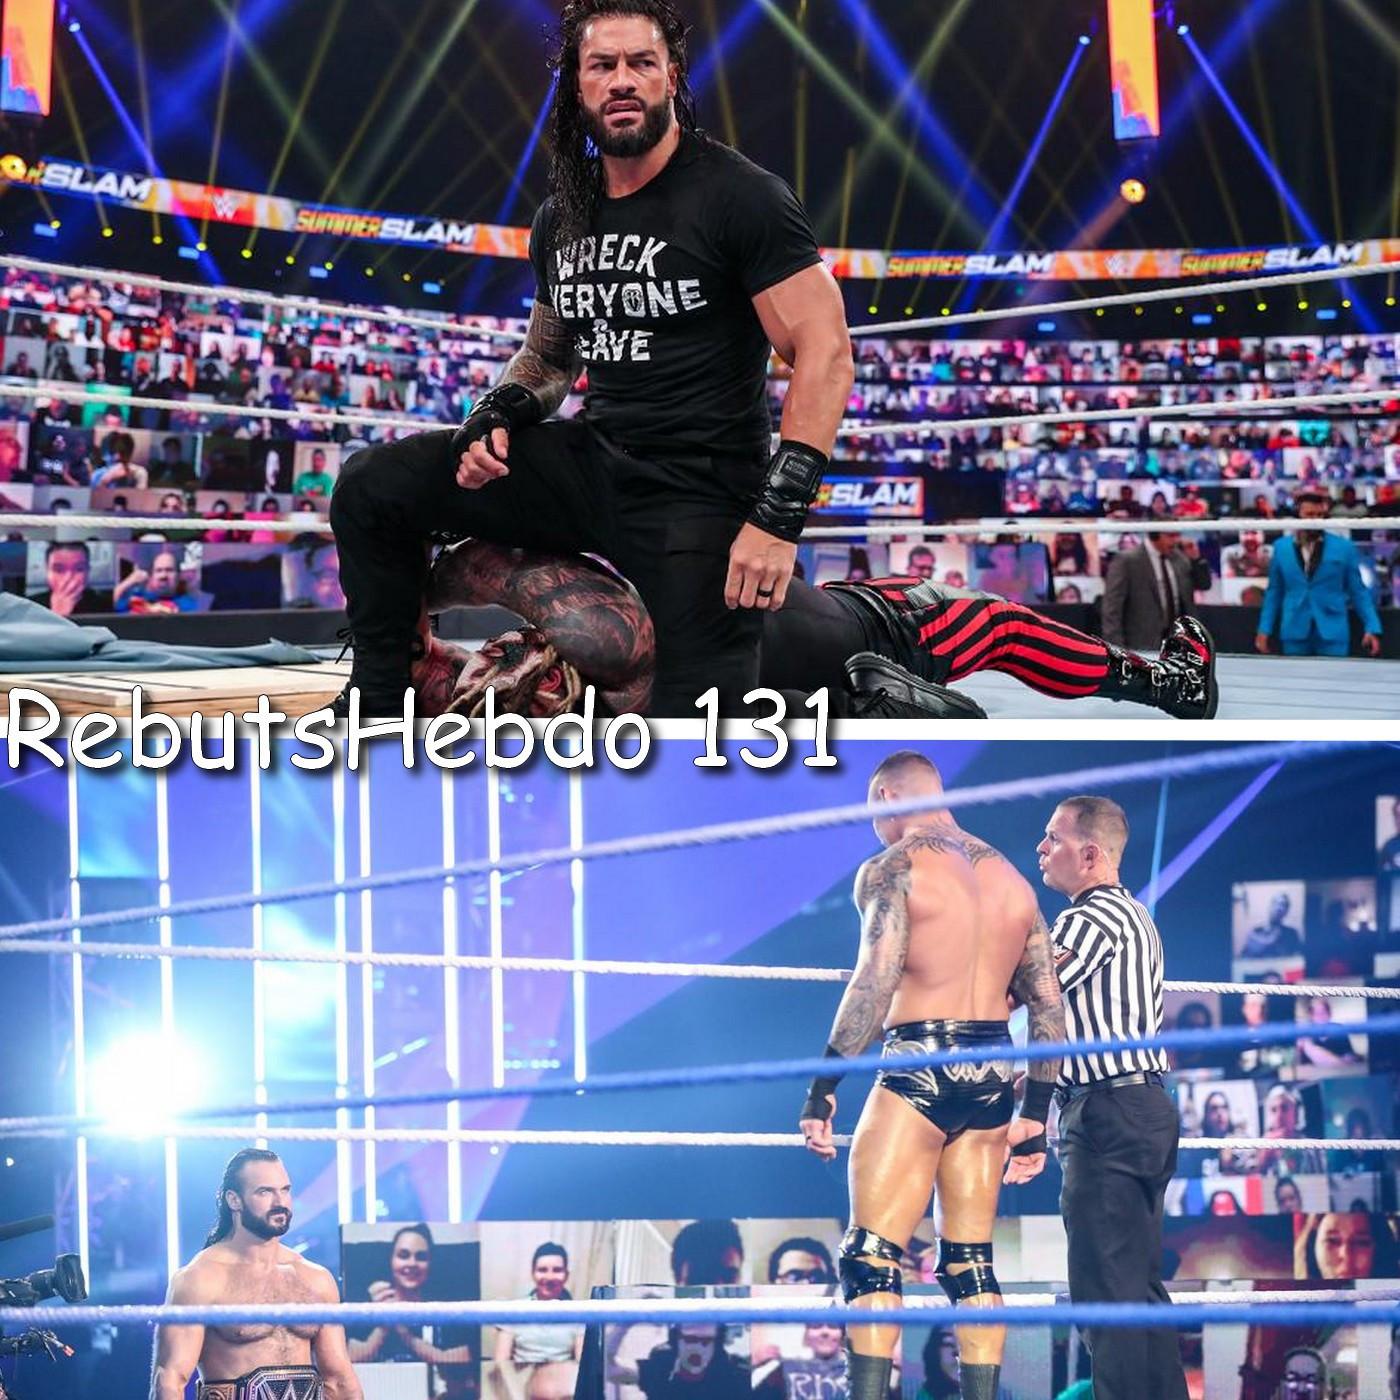 Les Rebuts du Catch : L'Hebdo #131 : Review NXT Takeover XXX & Summerslam 2020